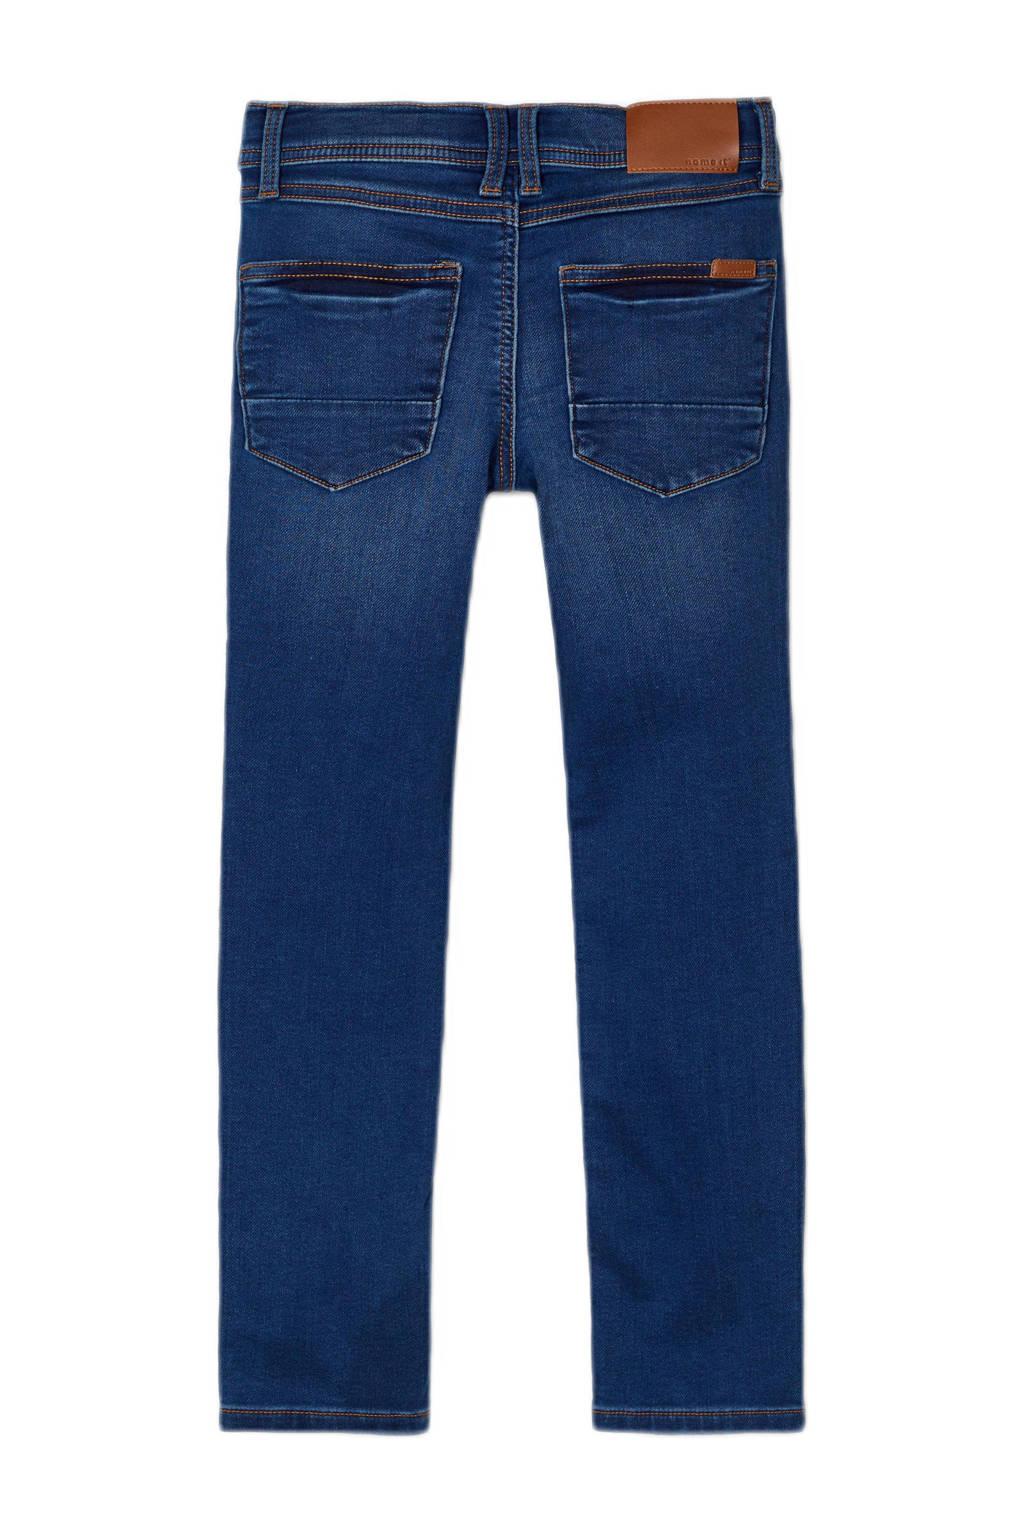 NAME IT KIDS slim fit jeans Theo dark denim, Dark denim